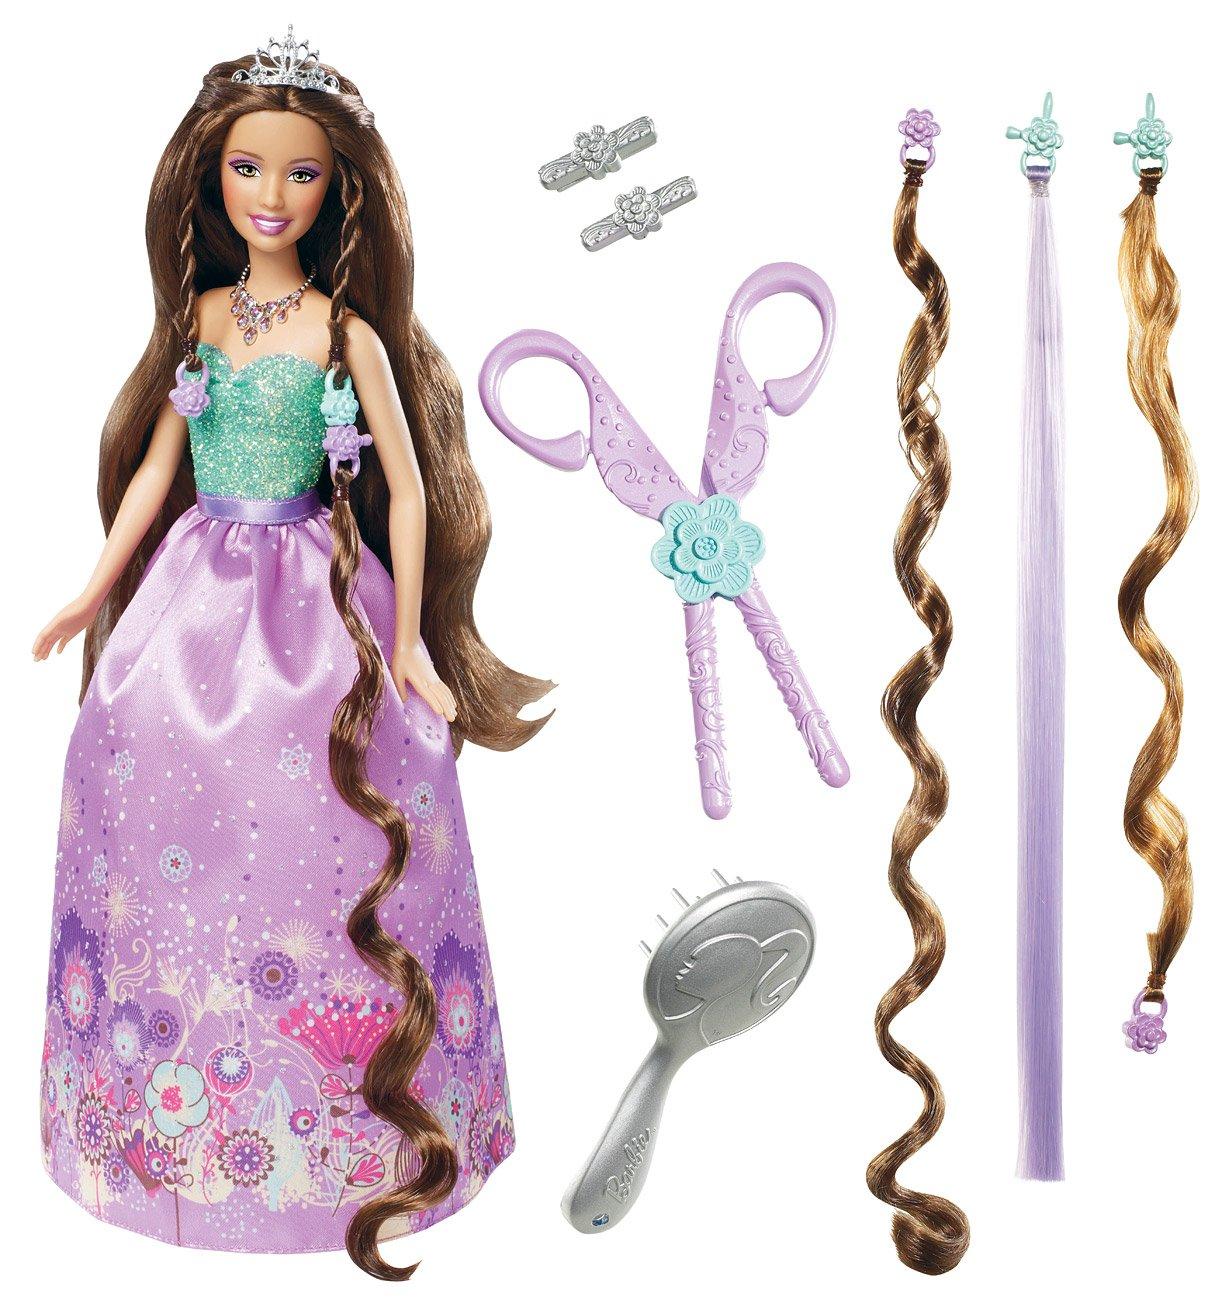 Mattel T7363  - Barbie, Zauber Haarspiel Prinzessin, Puppe, lila